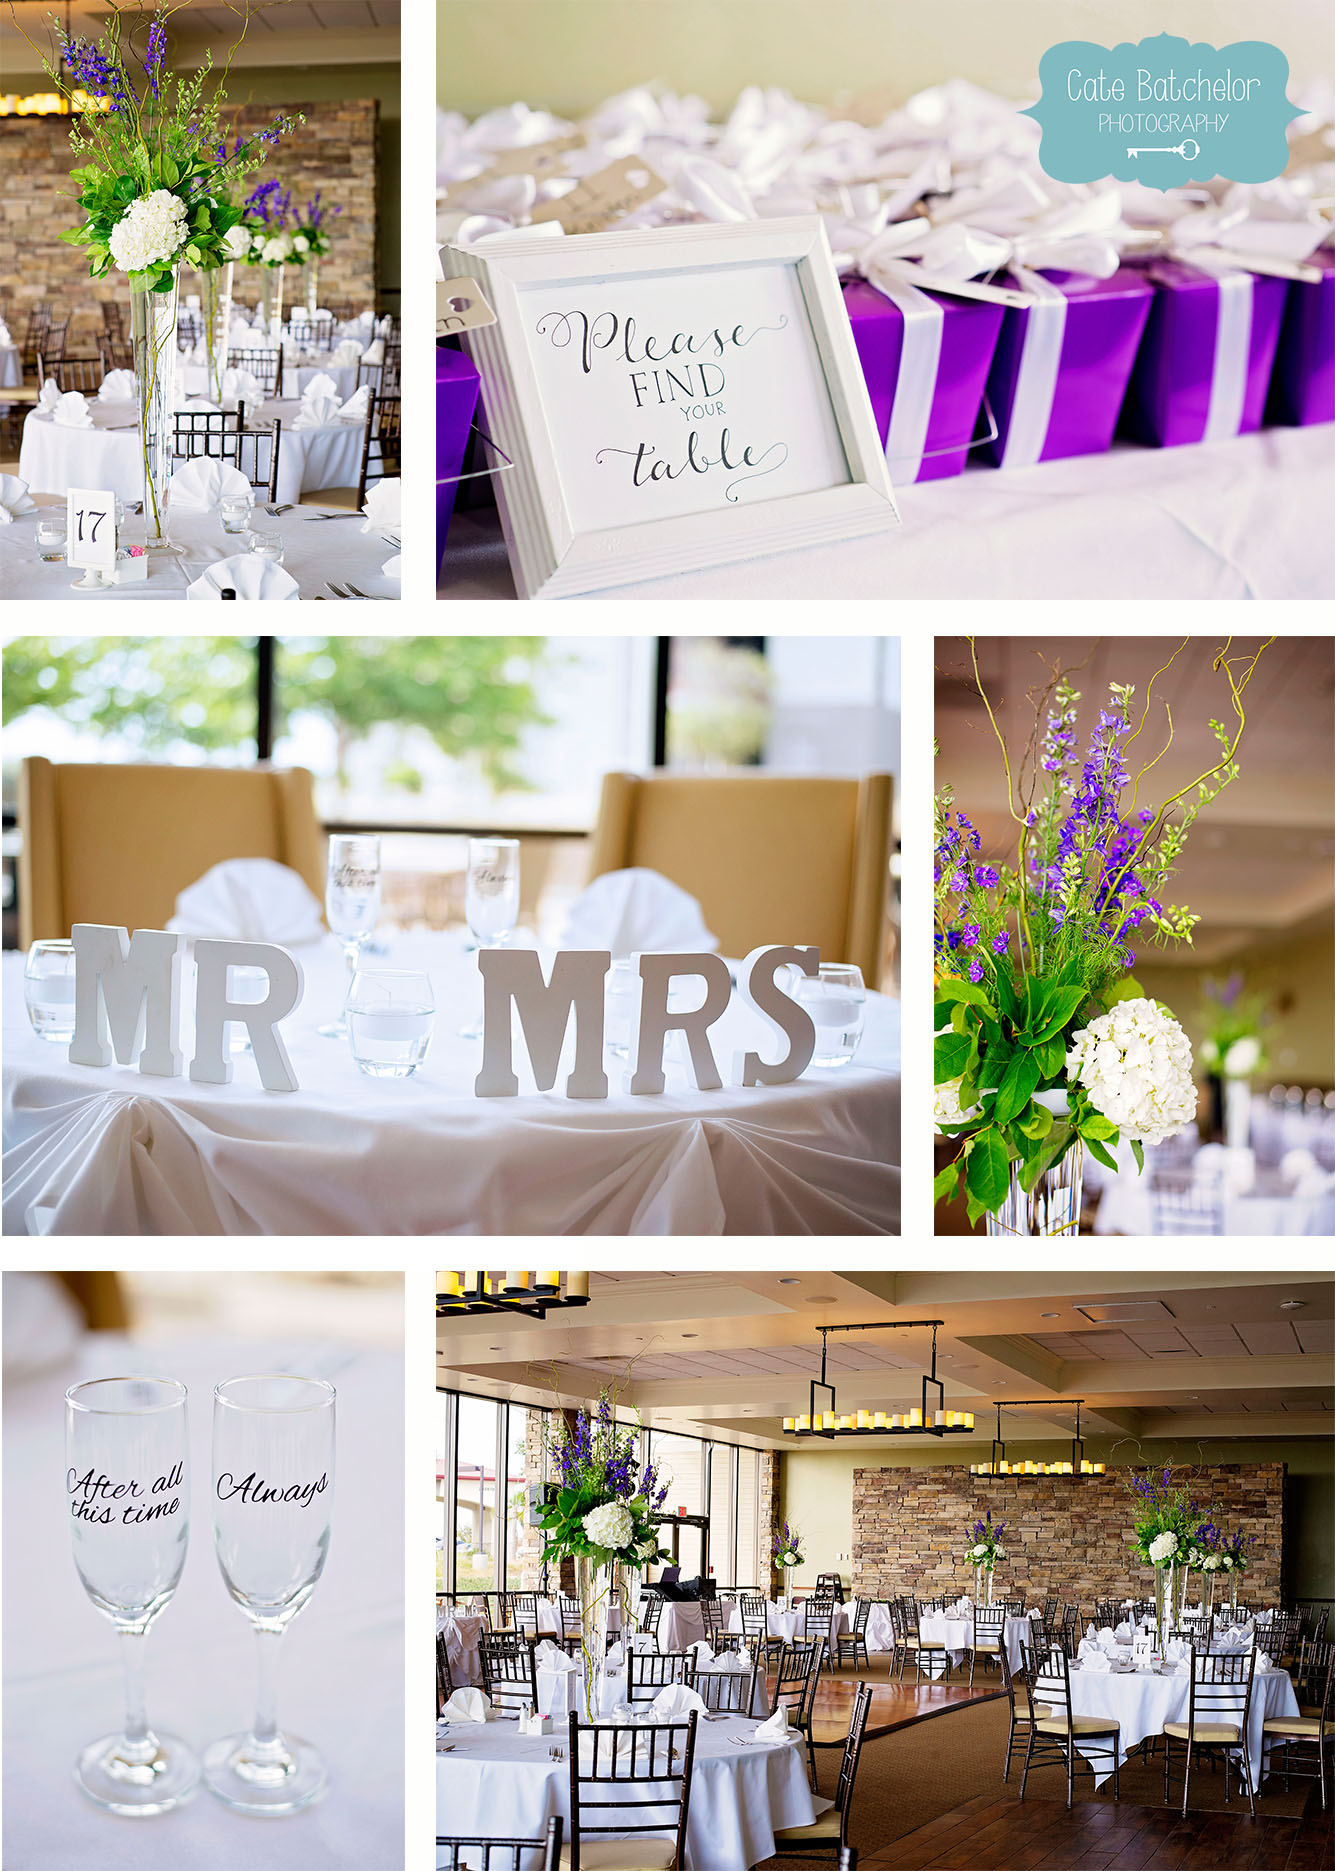 Beautiful reception details!